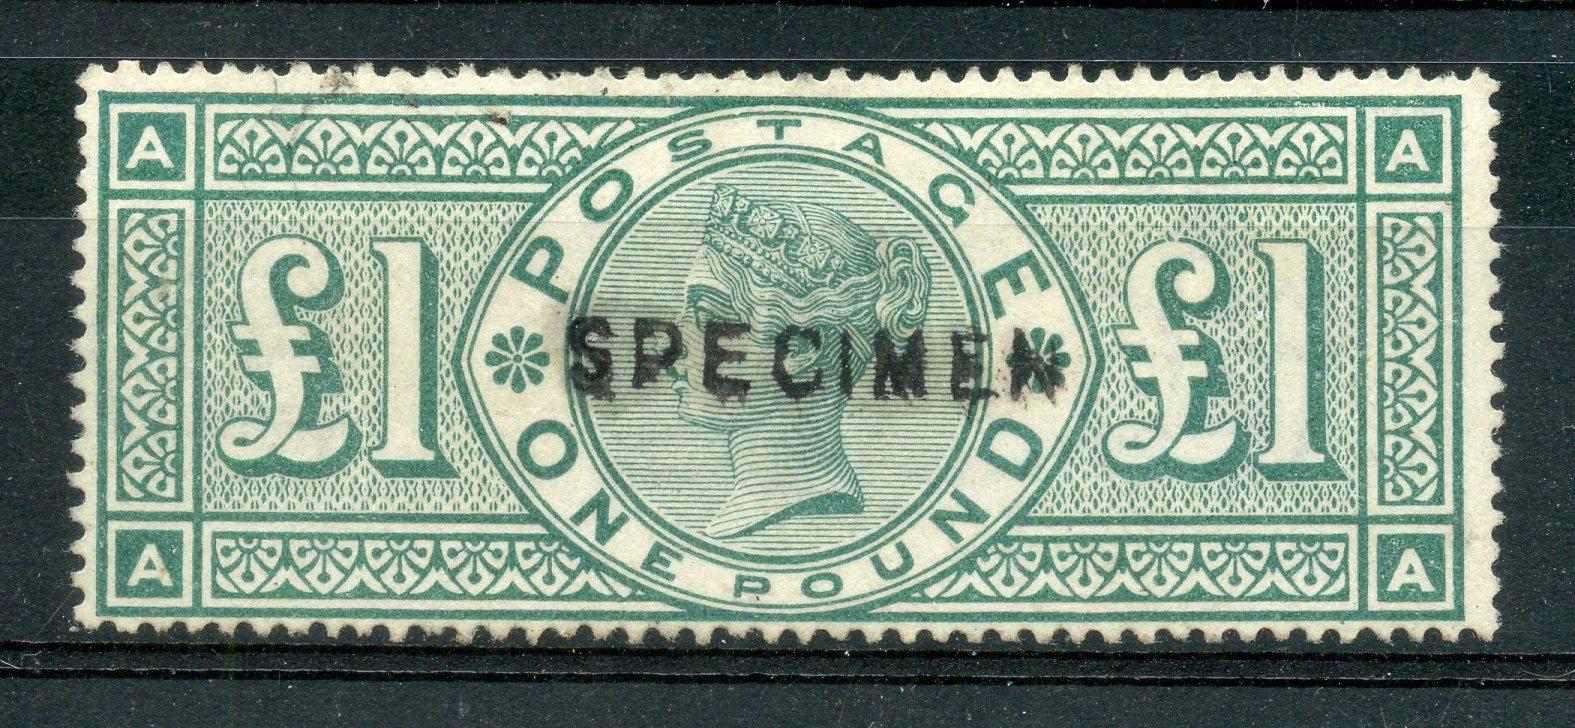 1891 £1 green (AA) opt Specimen unused. SG 212s. Cat £1100.